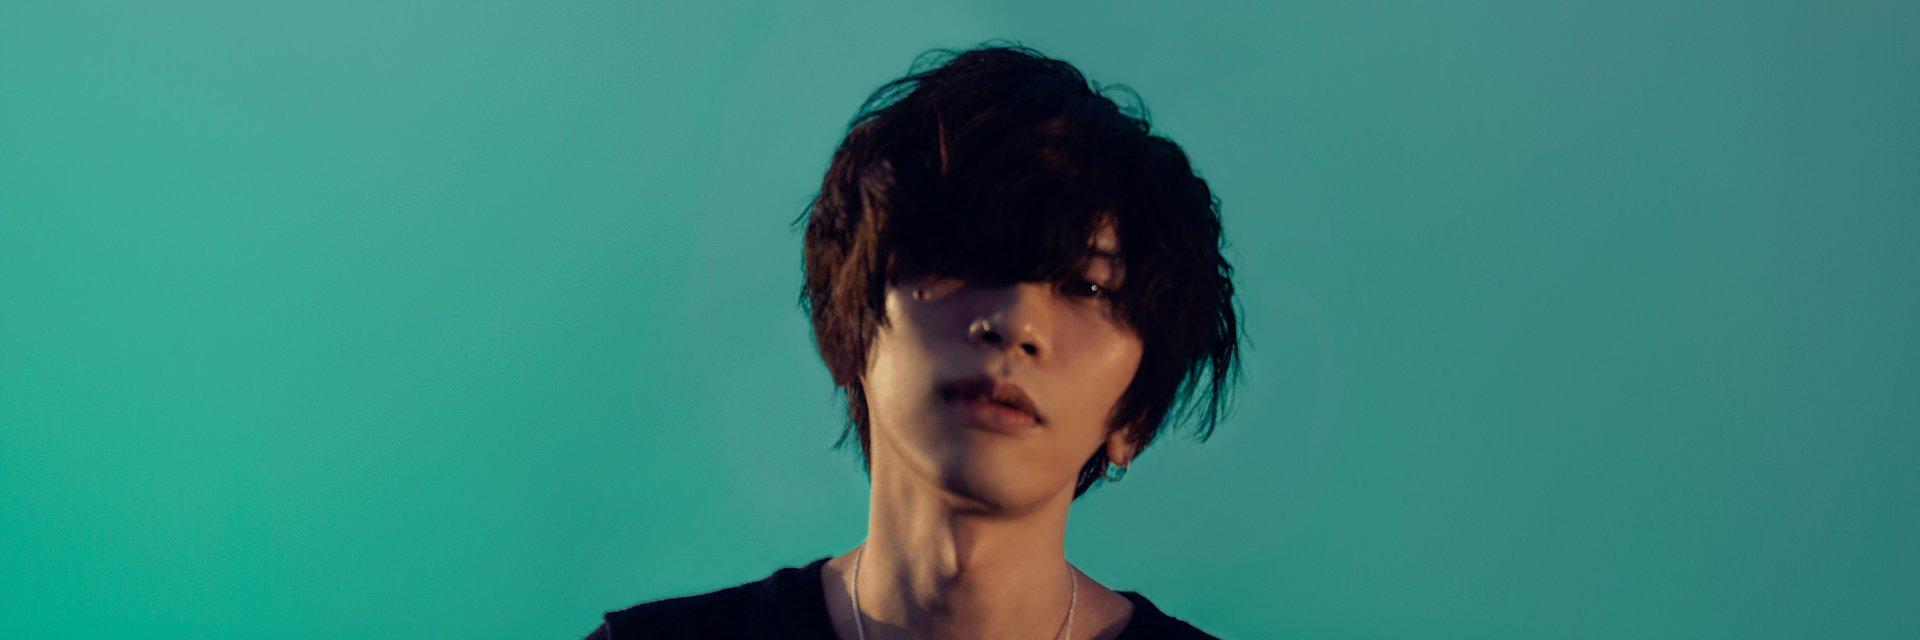 Gwiazda J-Popu, Kenshi Yonezu zaprasza na koncert w Fortnite!